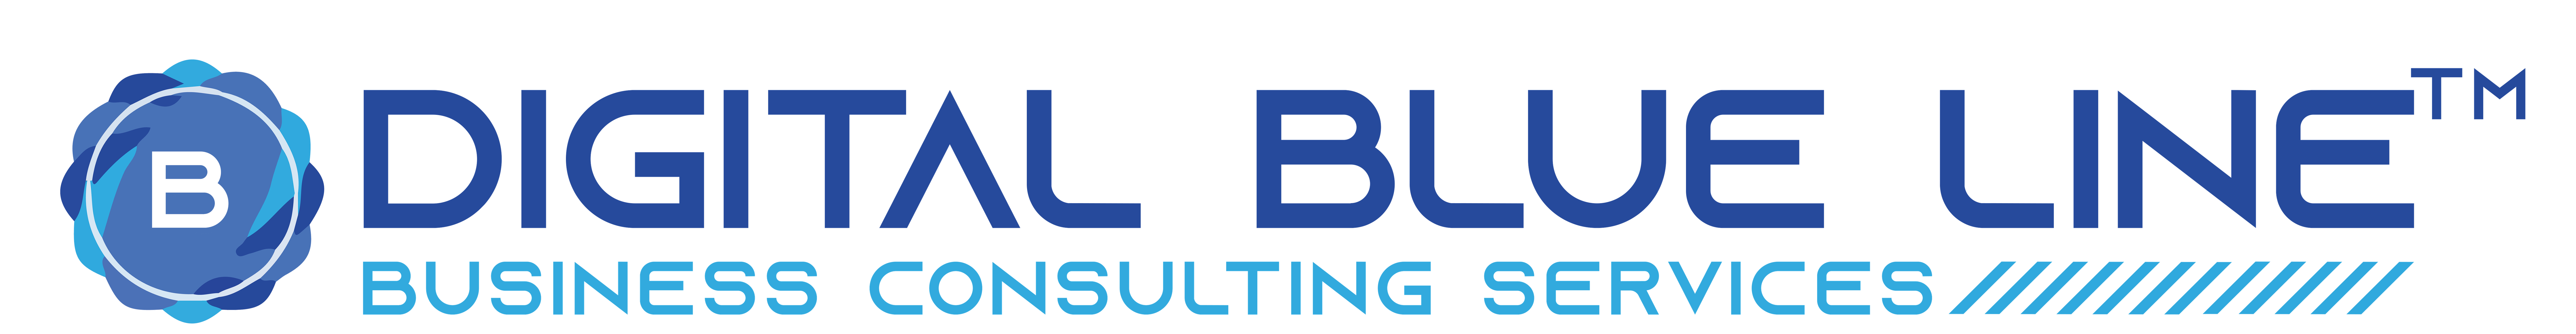 Digital Blue Line